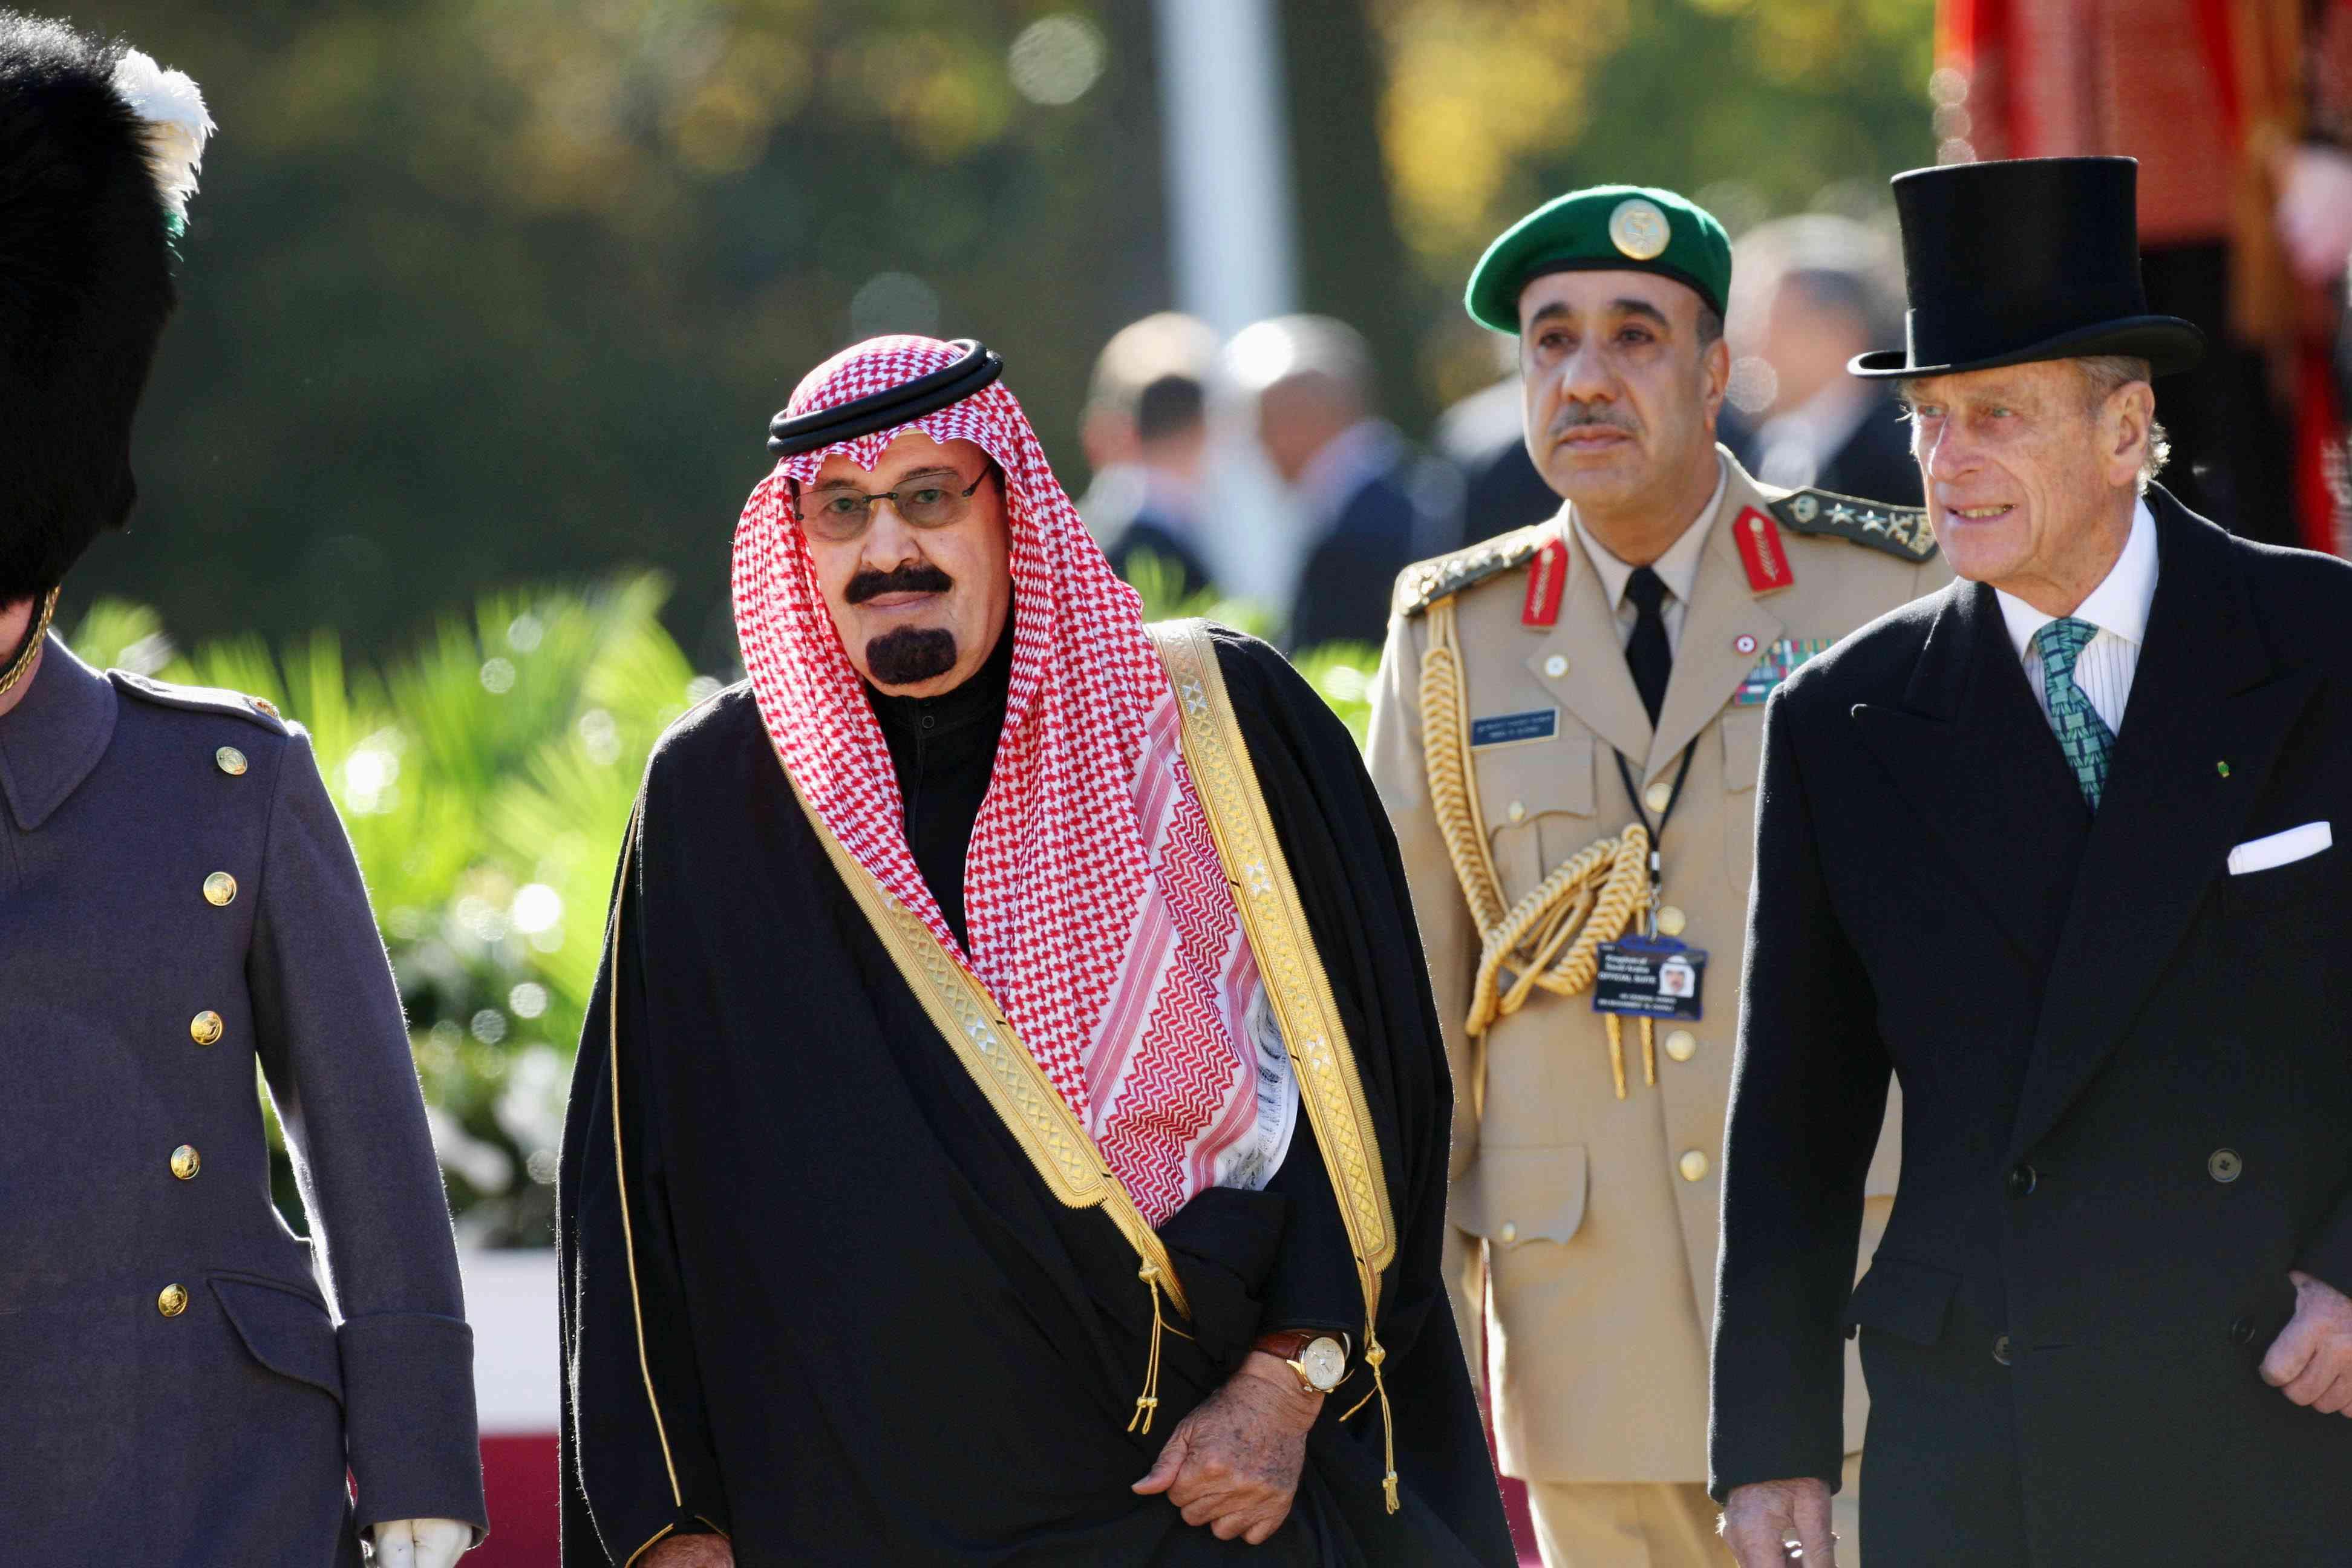 King Abdullah Bin Abdul Aziz Al Saud of Saudi Arabia during a state visit to the UK